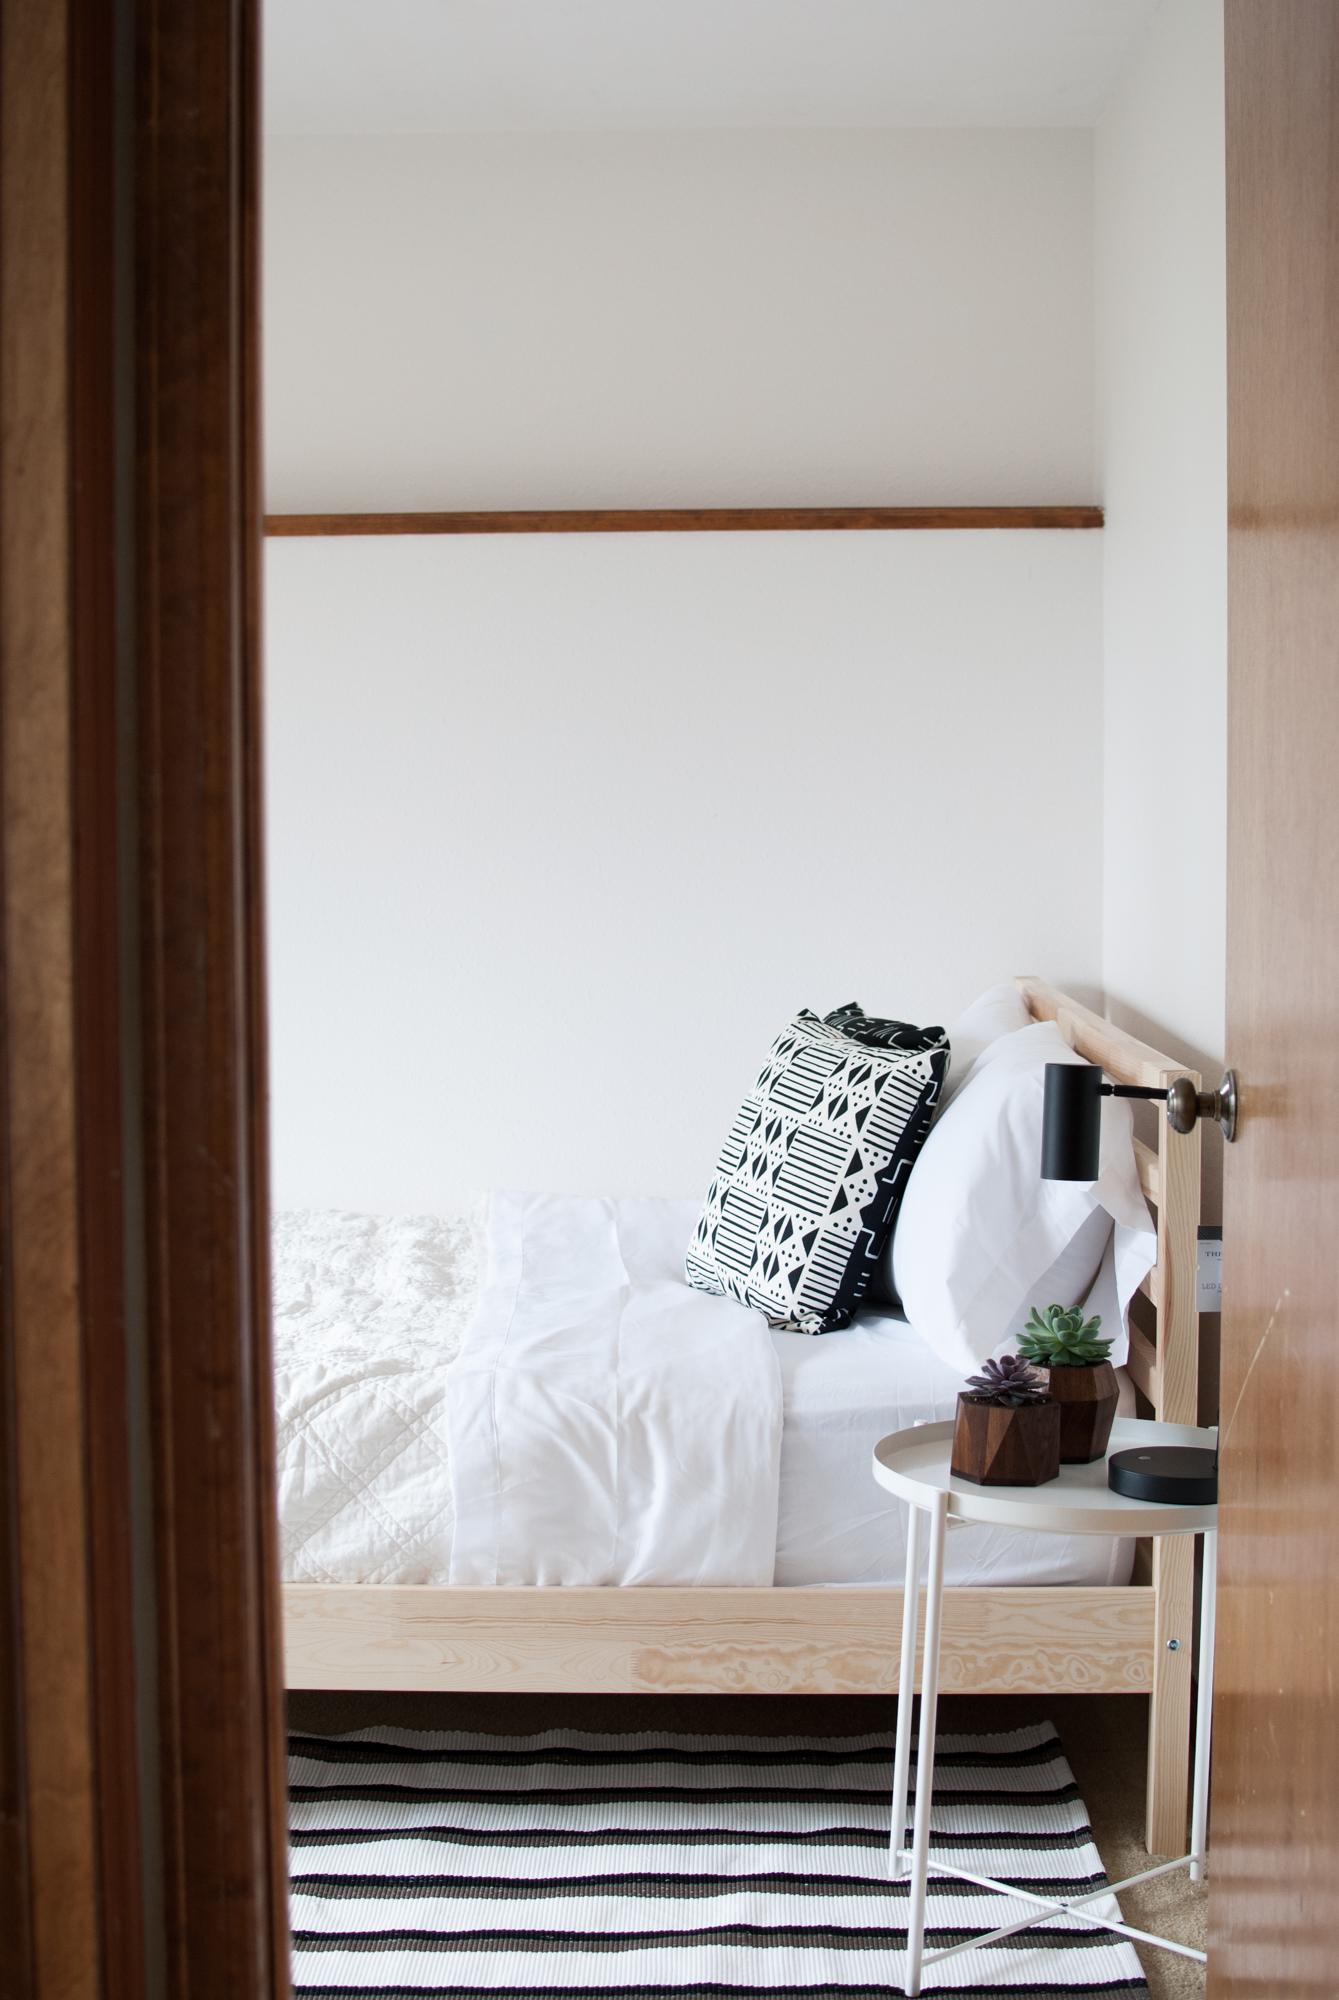 ClearCreekRetreat-airbnb-0348.jpg